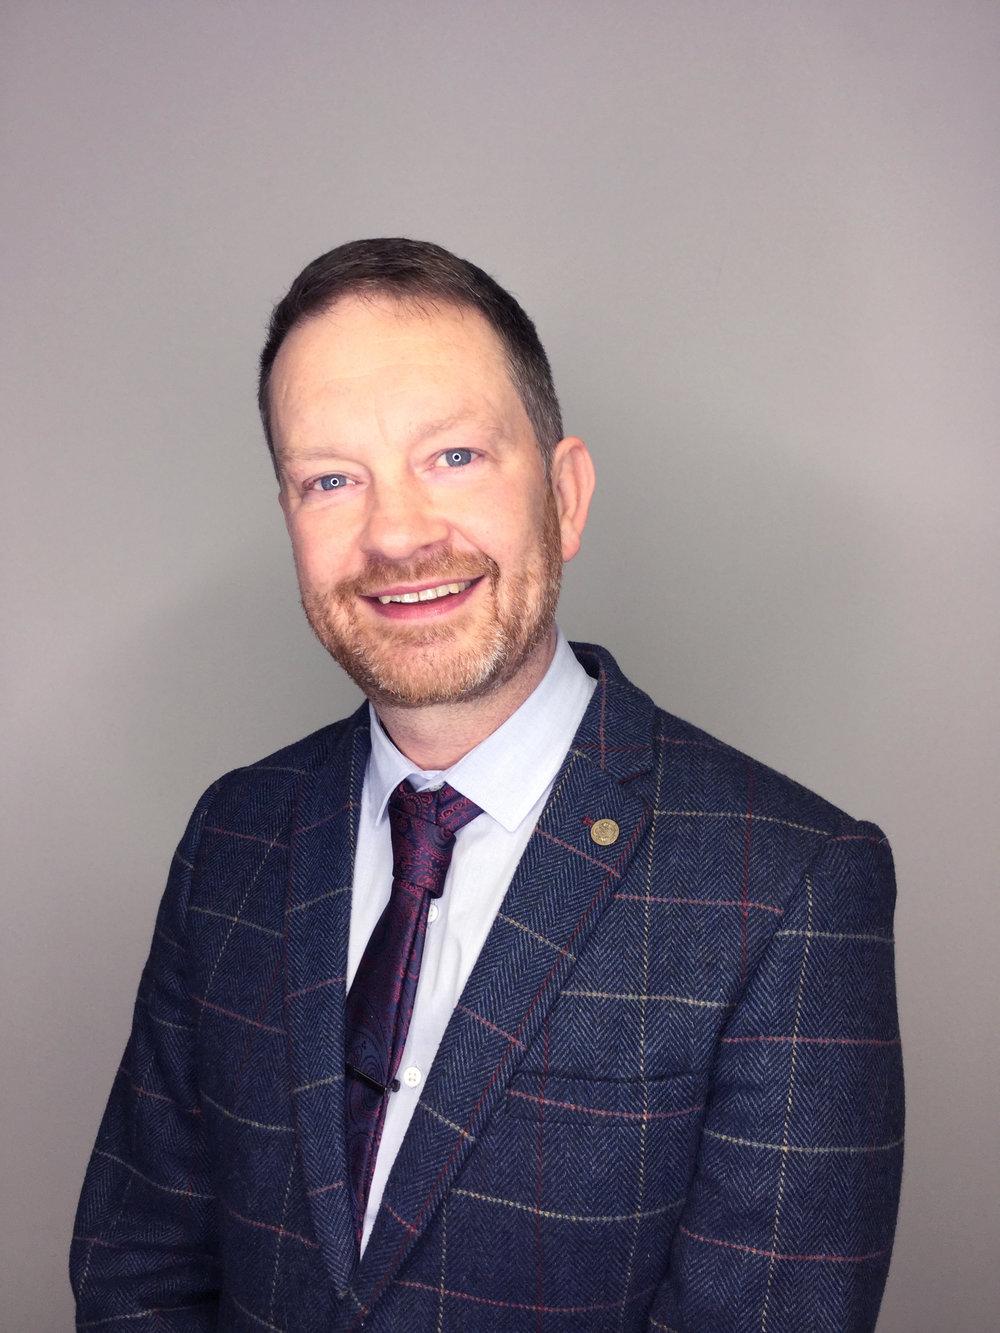 Matt Larkin - Operations Manager